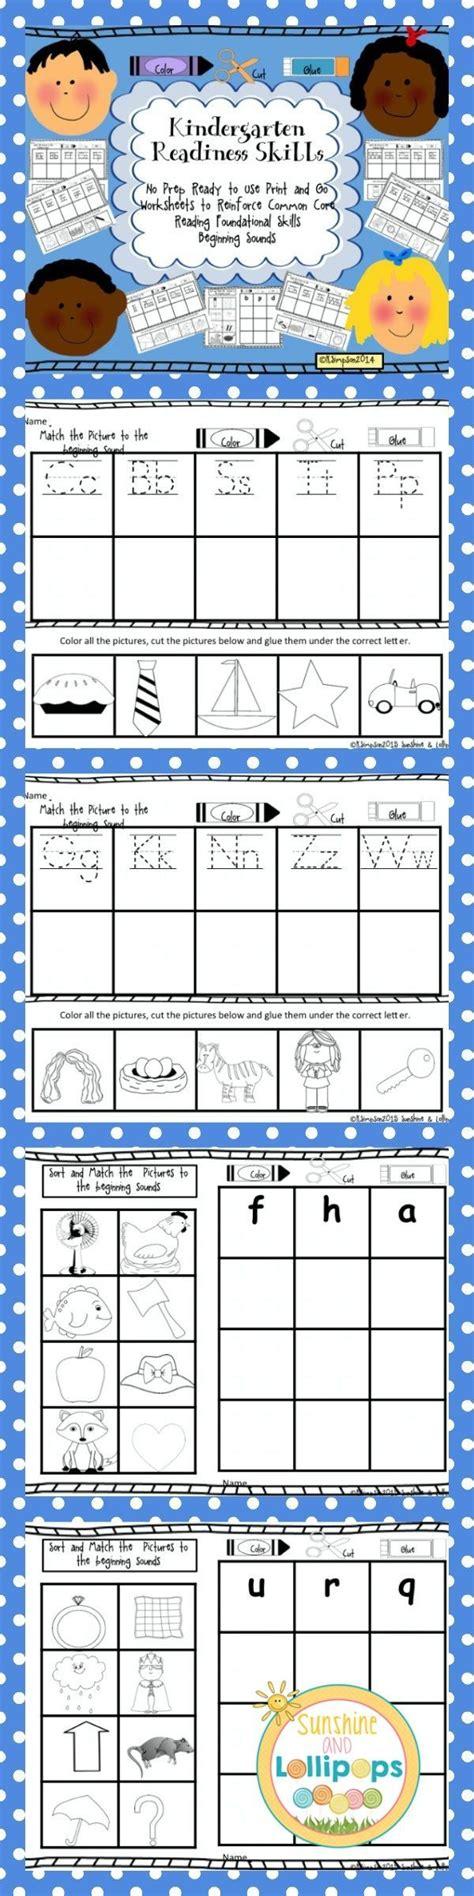 best 25 kindergarten readiness ideas on 967 | 38820665eb271f1b38dfc023df9f7284 starting kindergarten kindergarten readiness